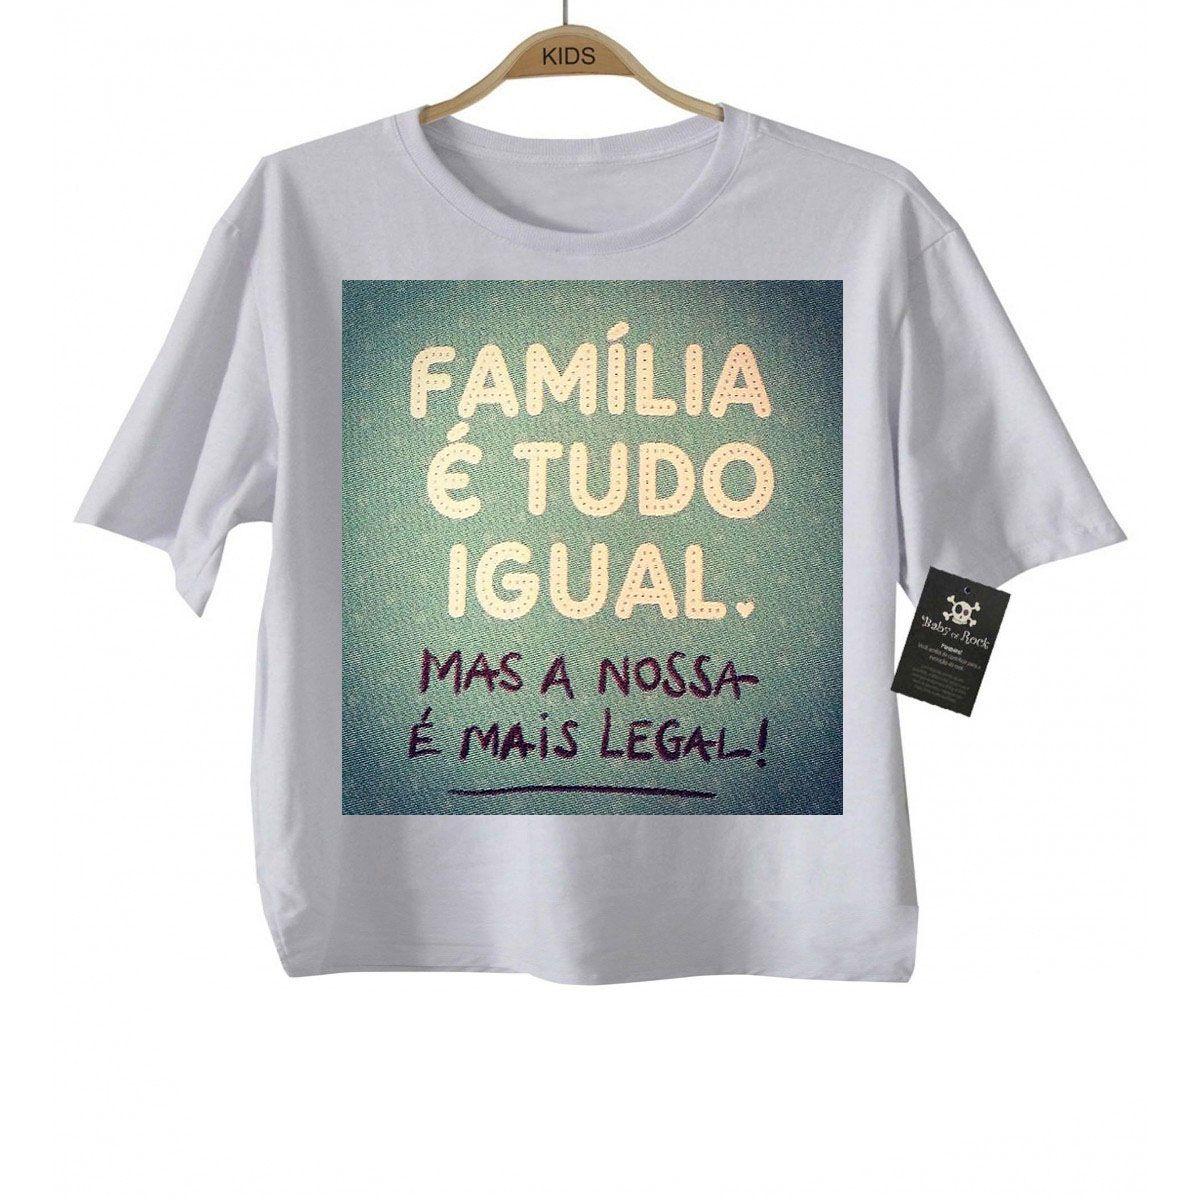 Camiseta  Infantil - Família tudo igual   - White  - Baby Monster - Body Bebe